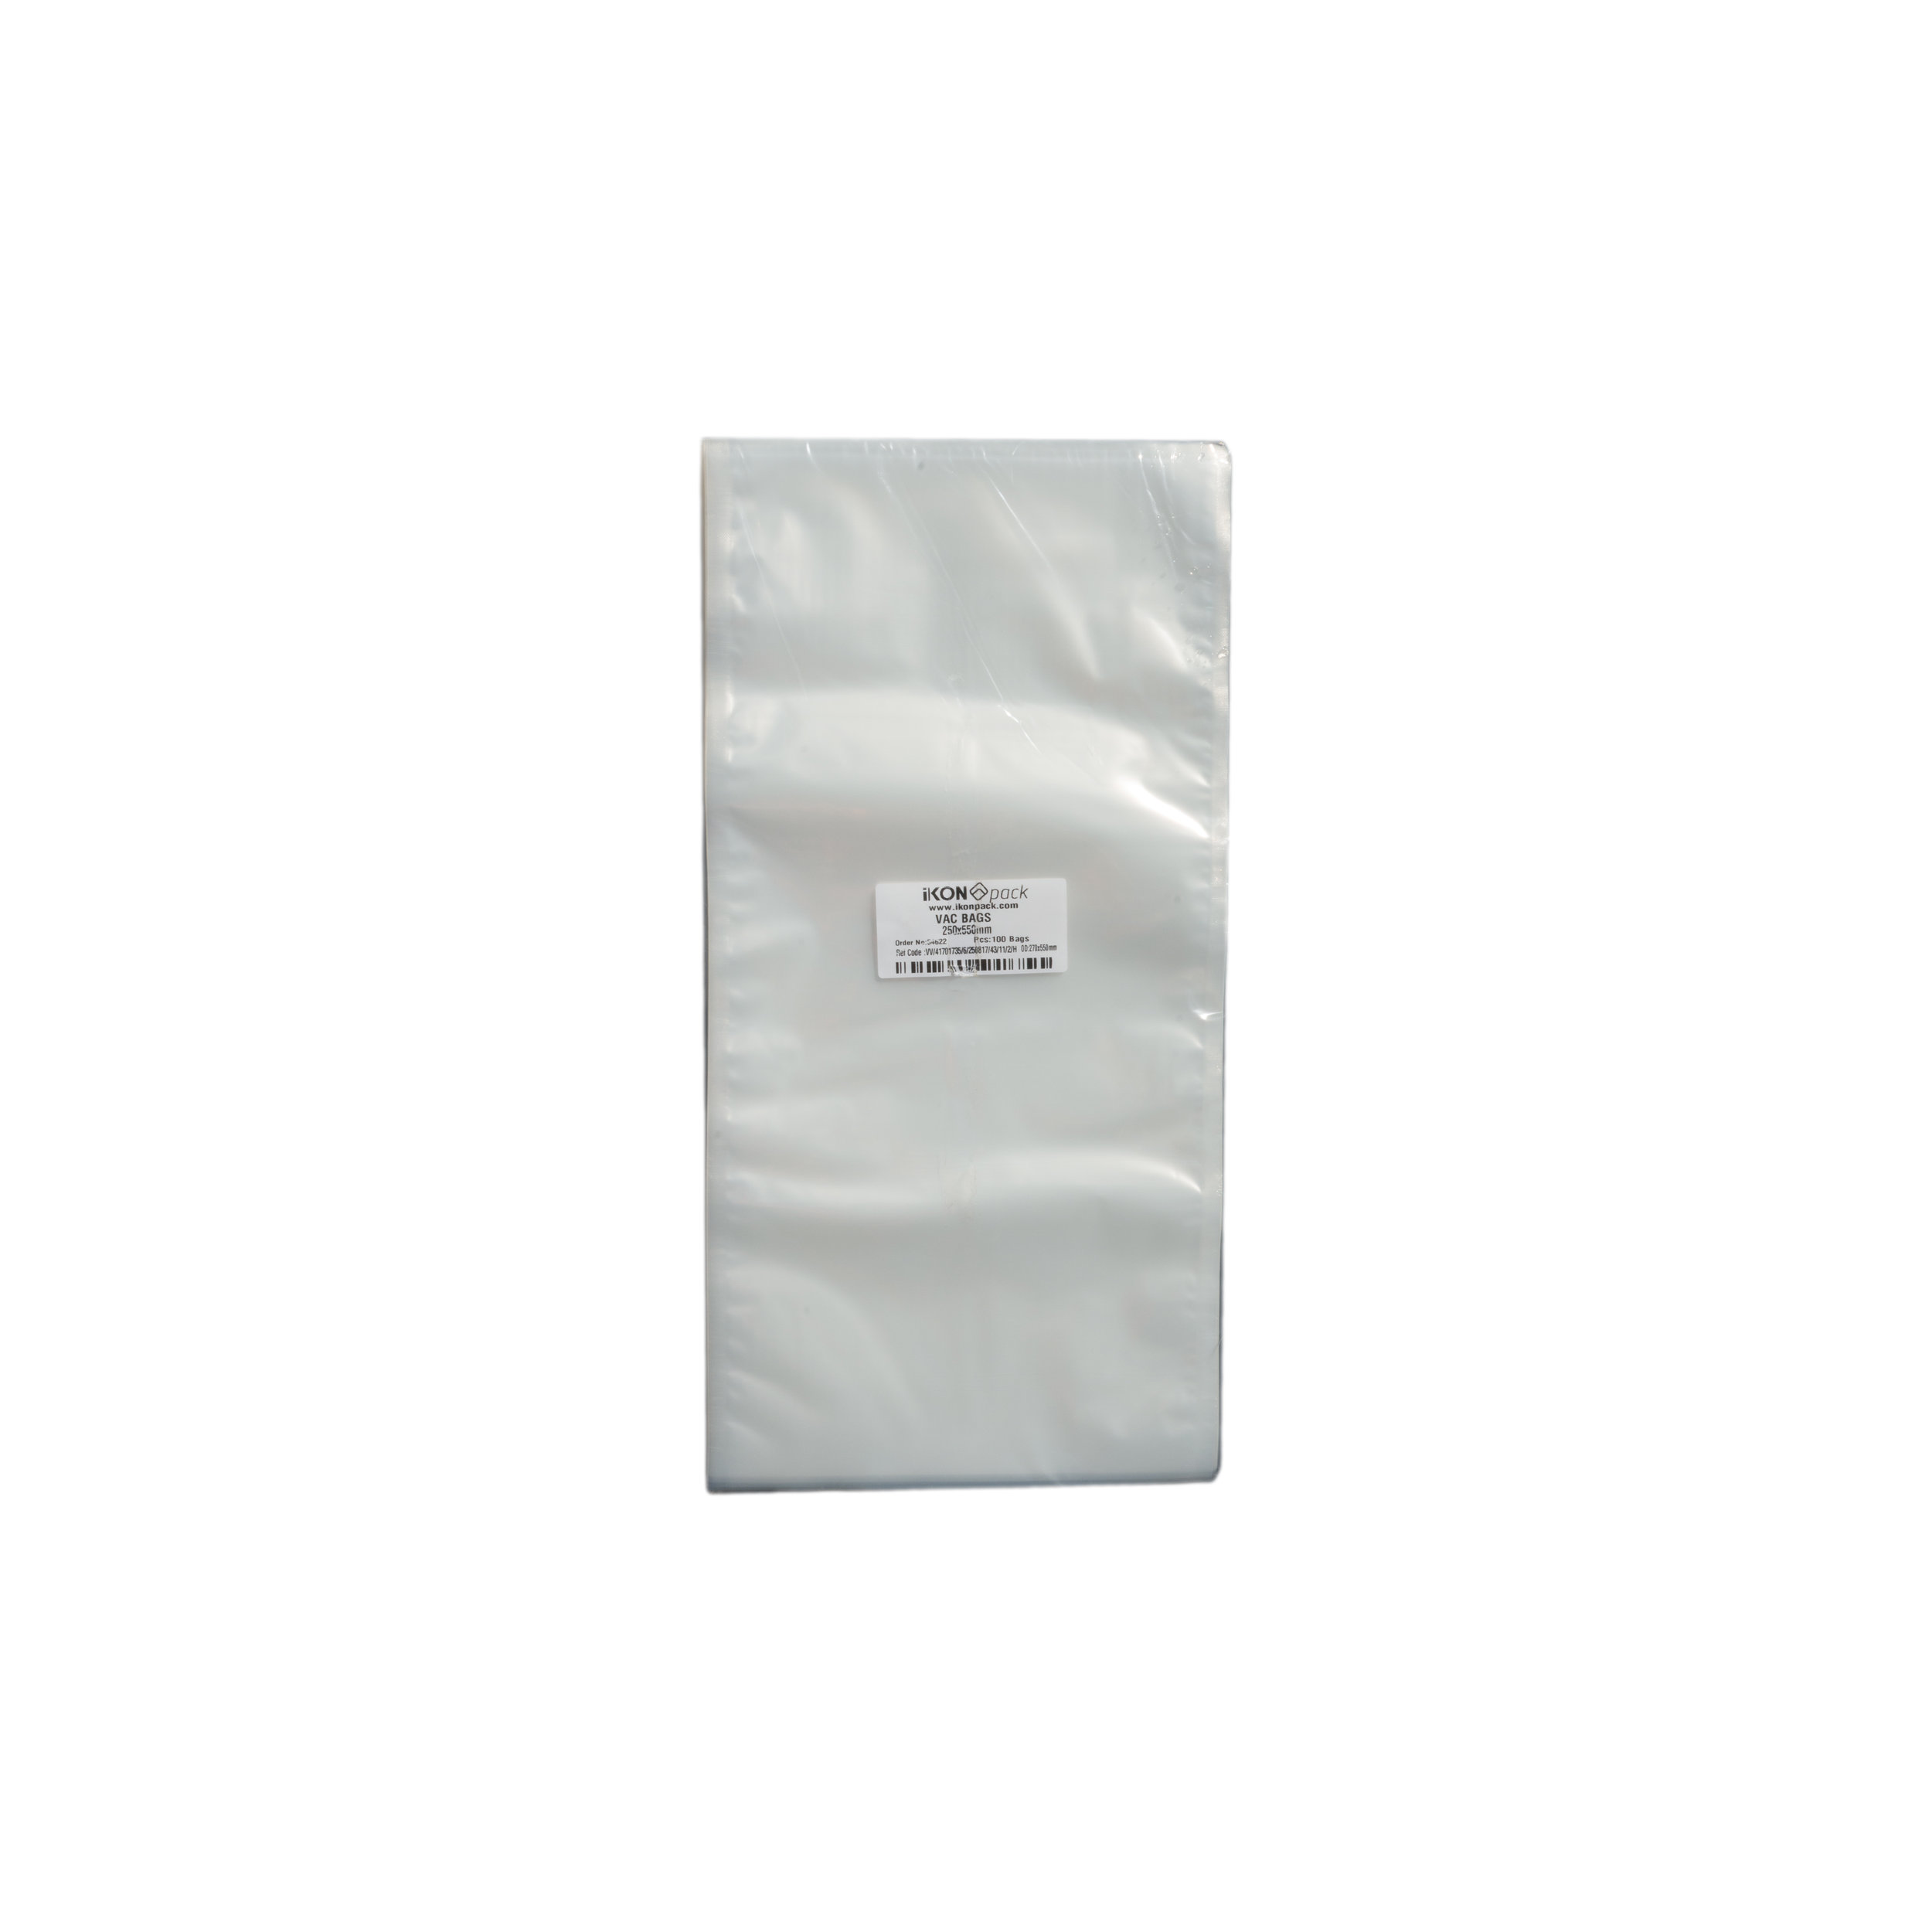 iK-VAC2555      VACUUM POUCH 70 MICRON 250X550    100 per slv 1000 per carton